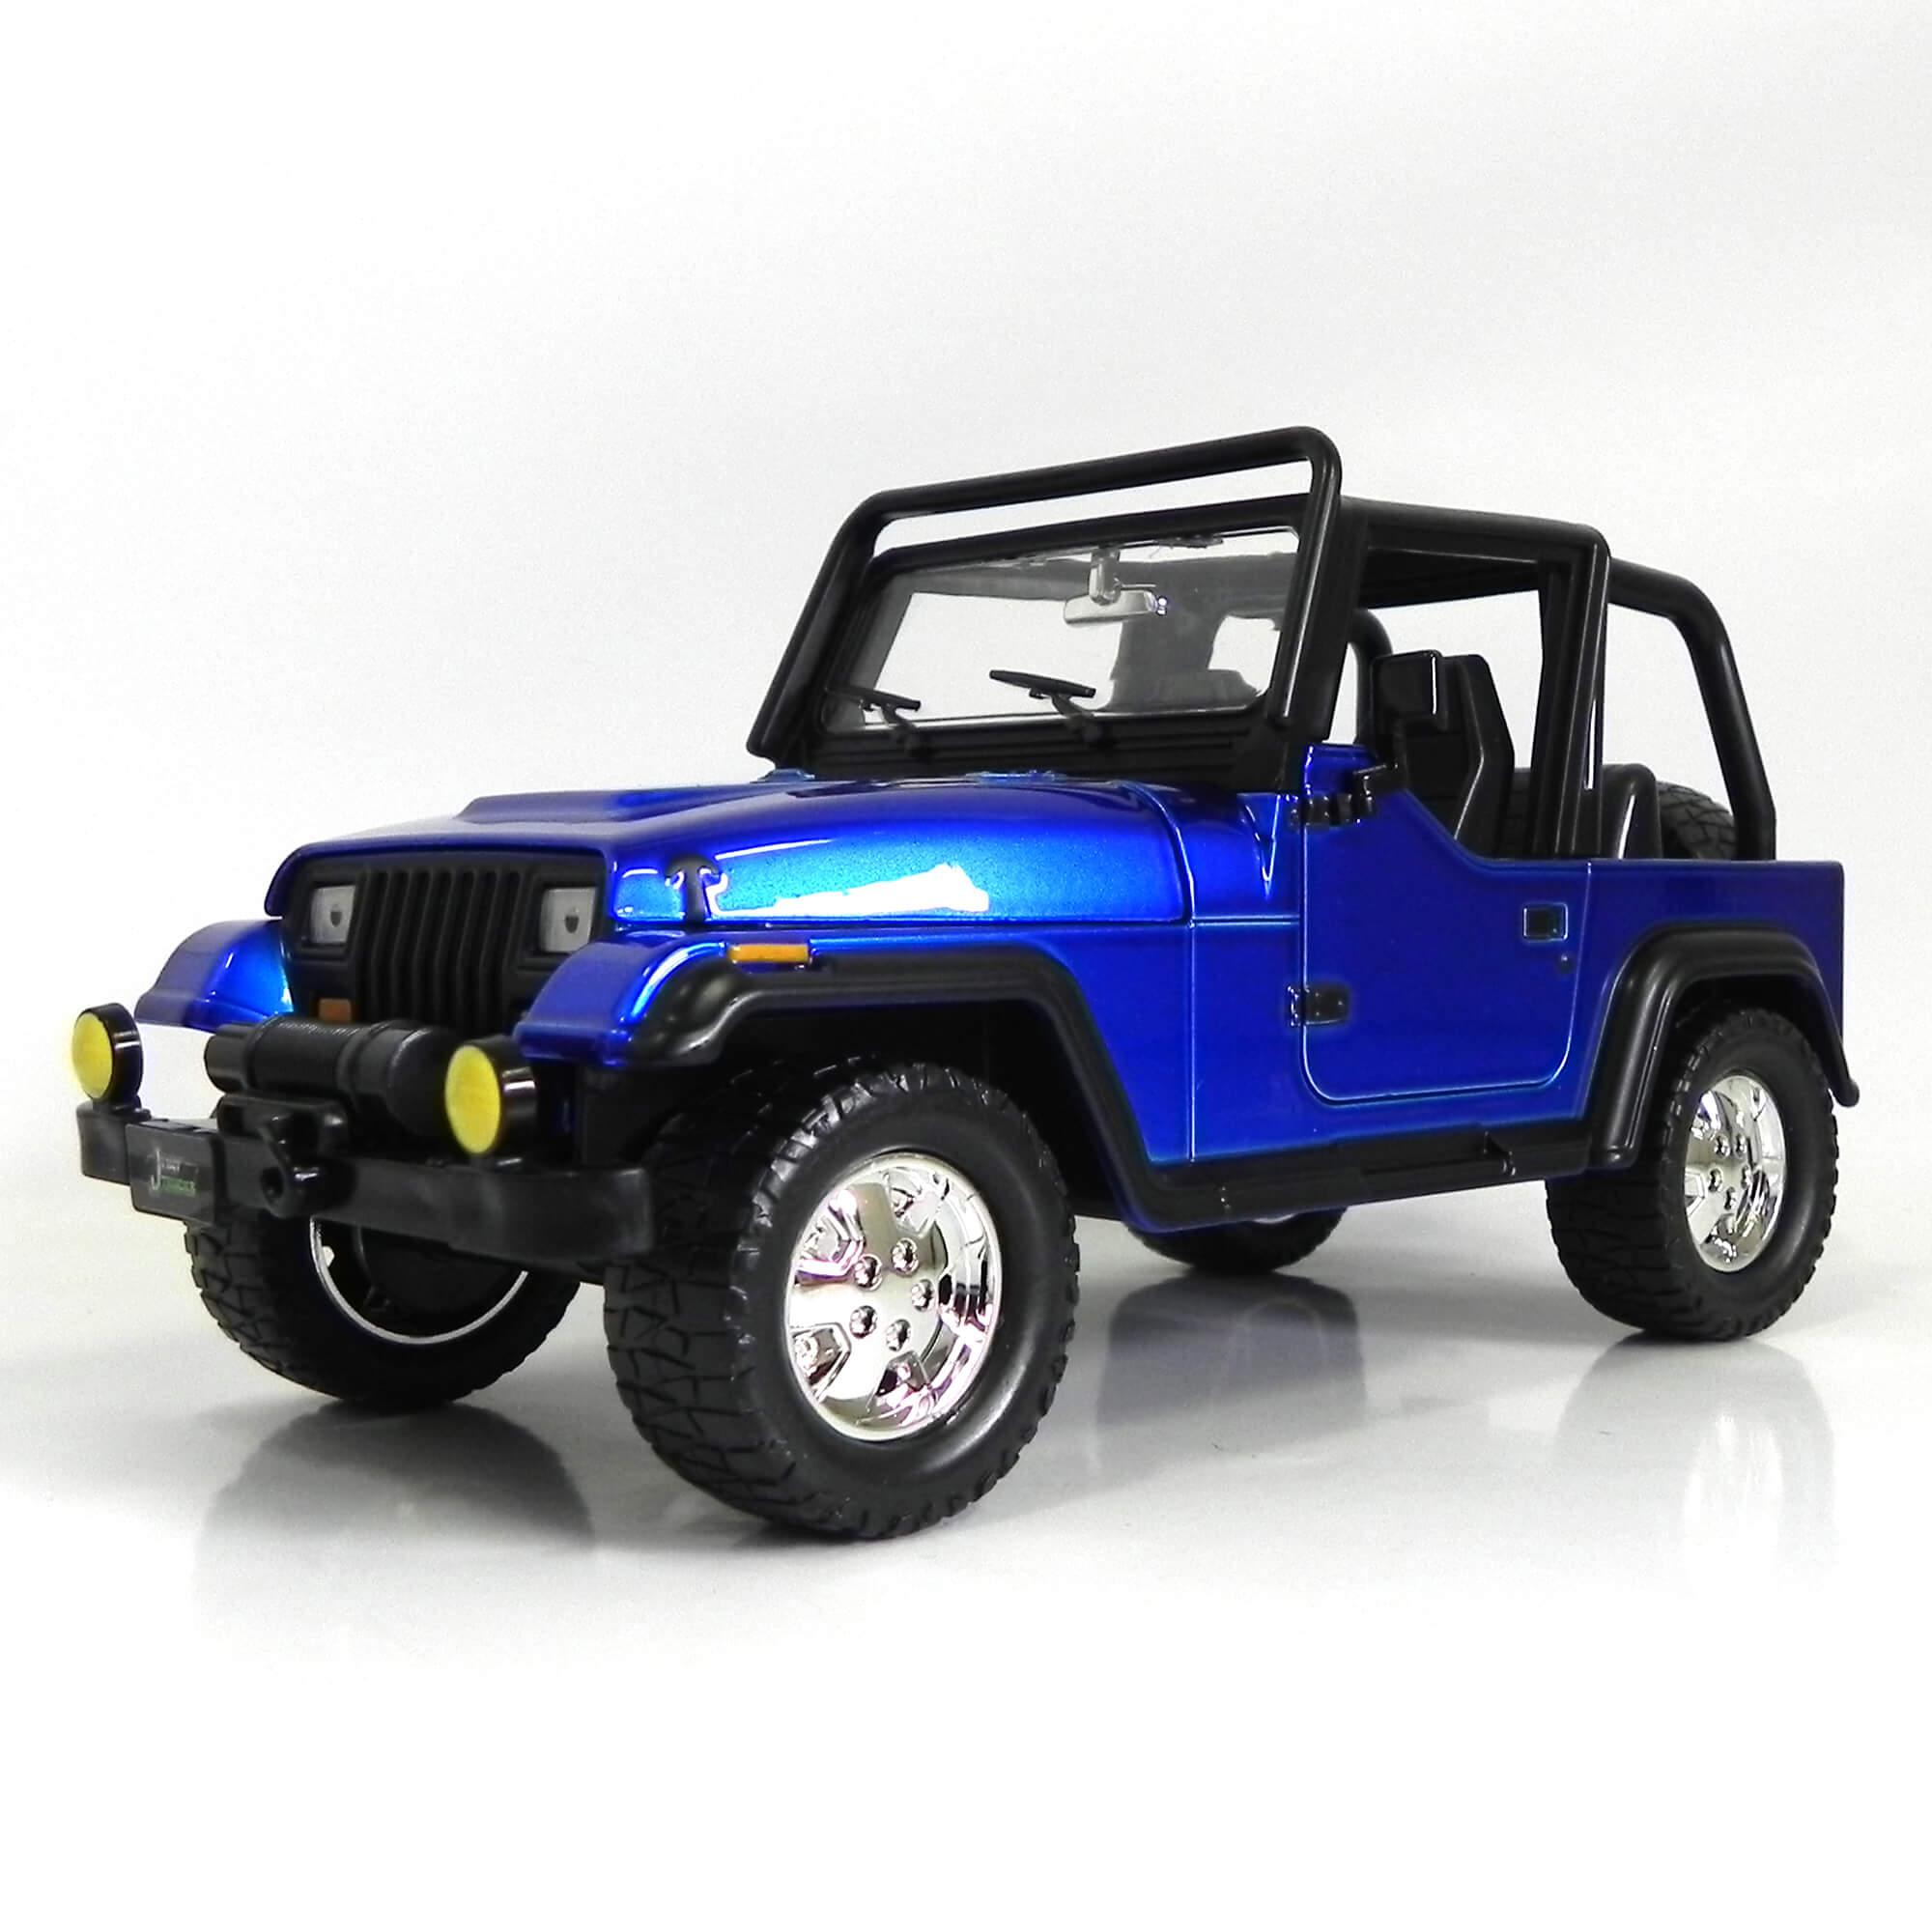 Miniatura Jeep Wrangler 1992 1:24 Jada Toys - Azul